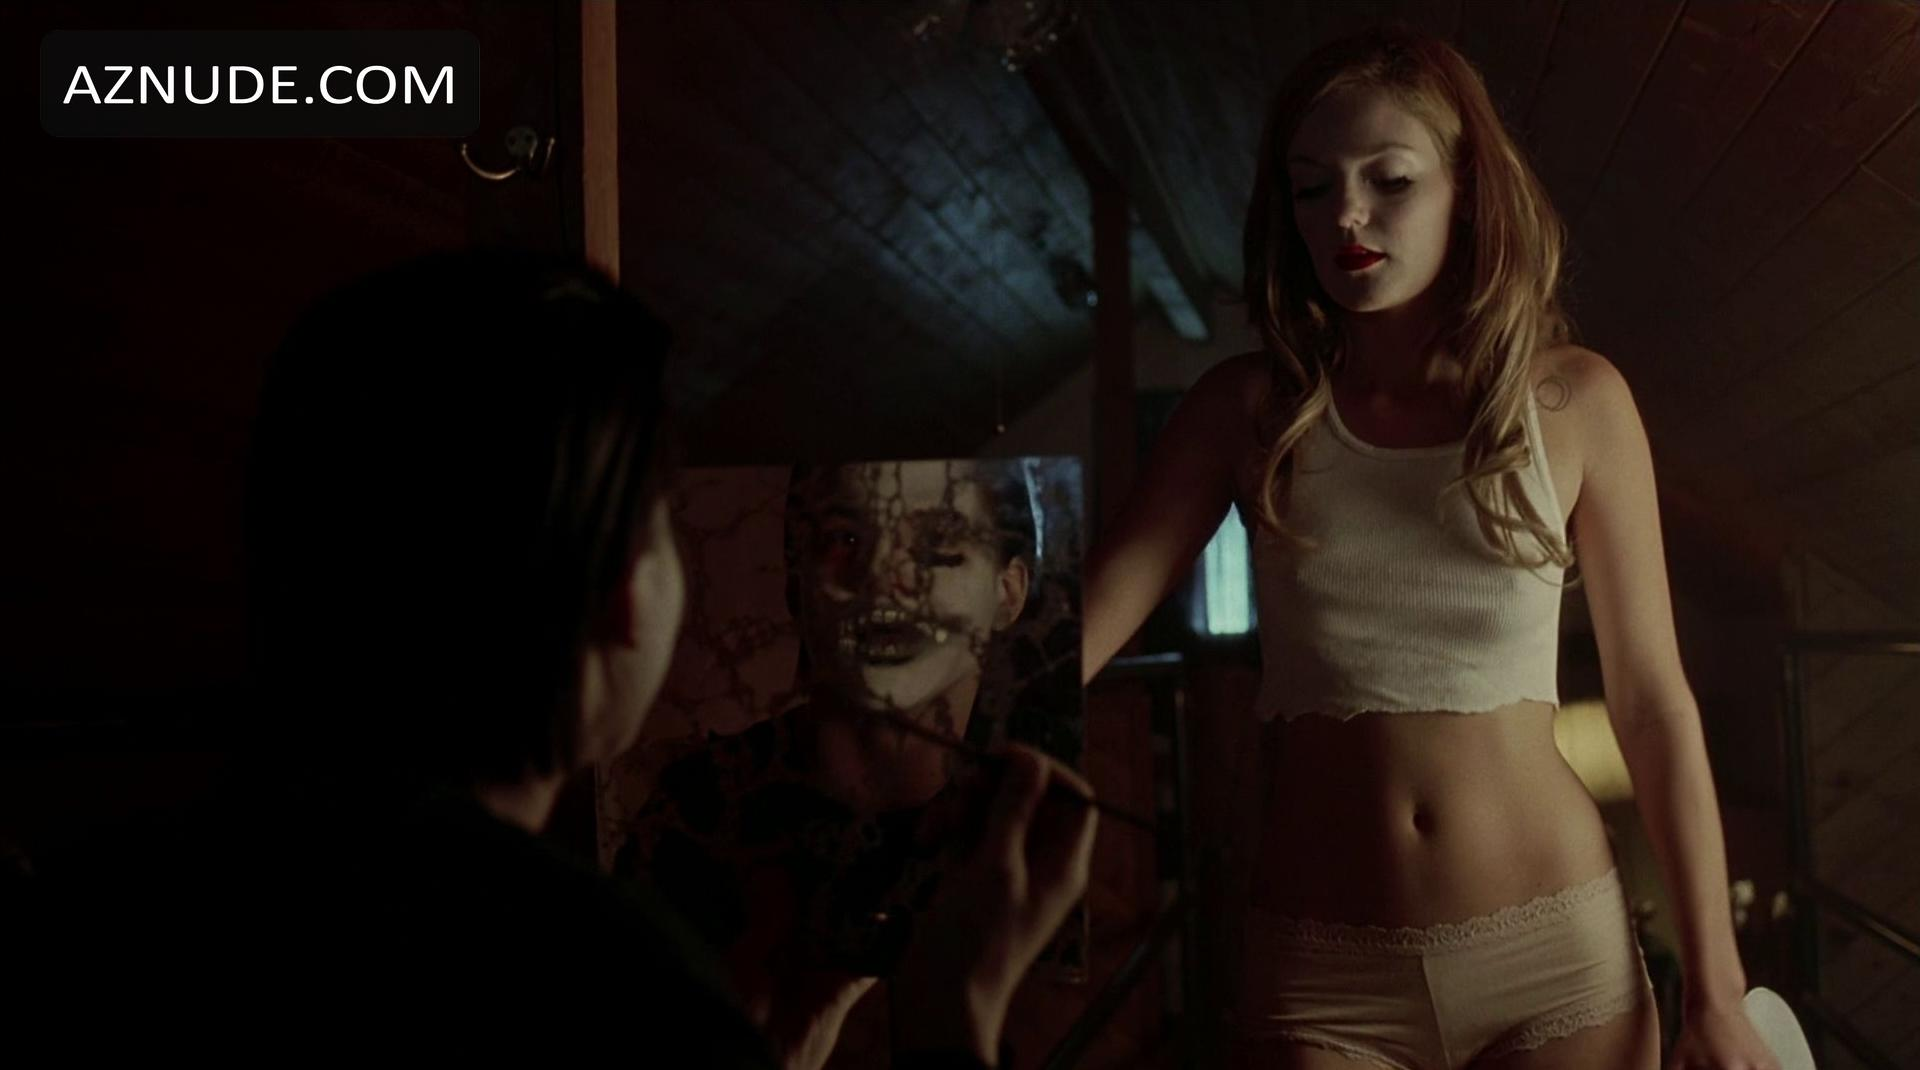 Kate winslet nude sex scene in little c scandalplanetcom 1